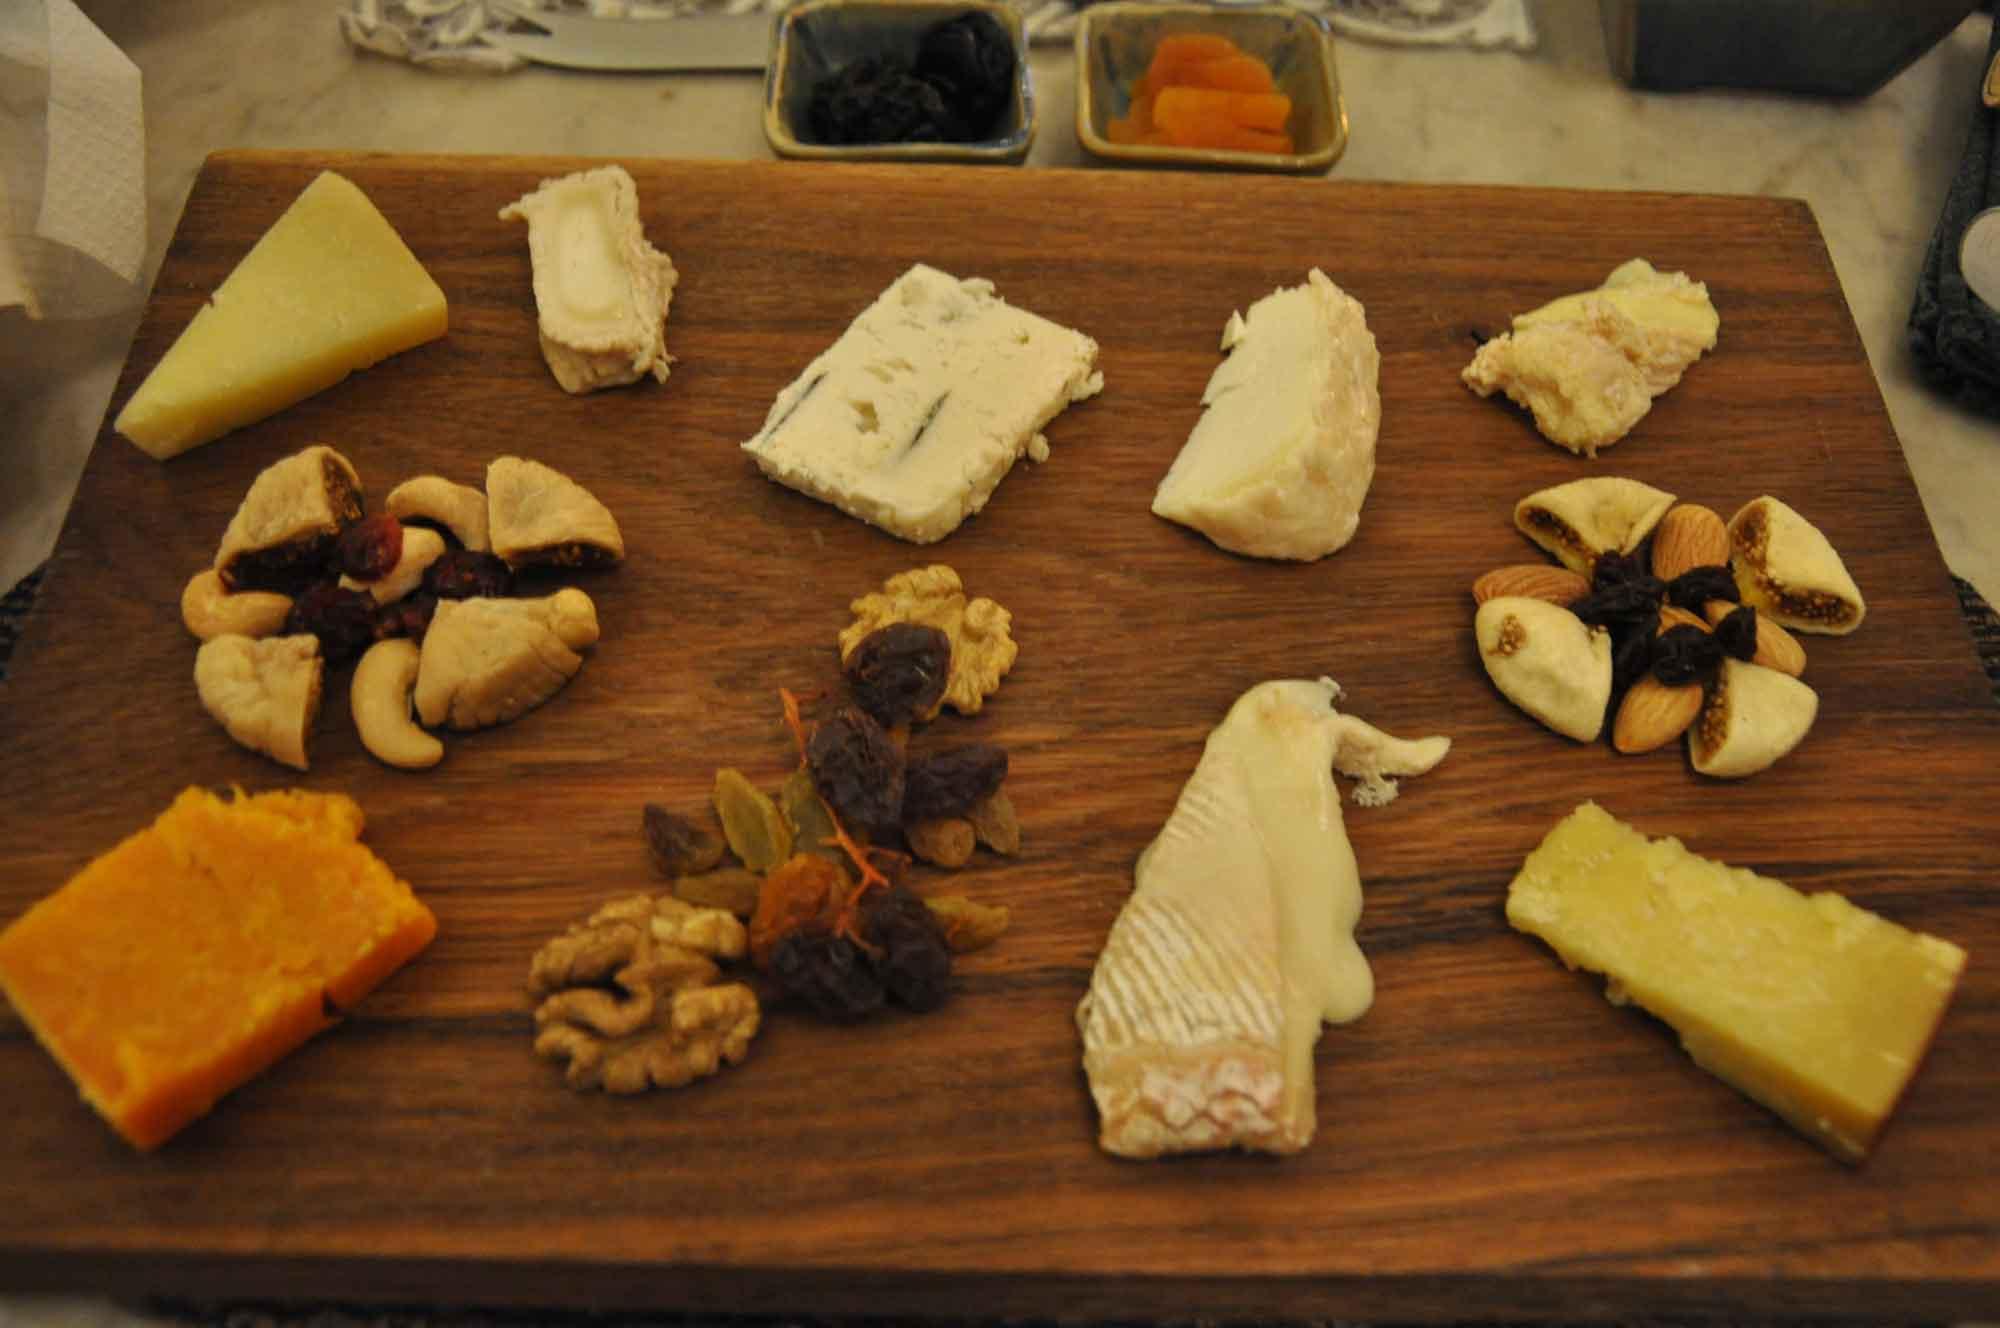 MacauSoul cheese board